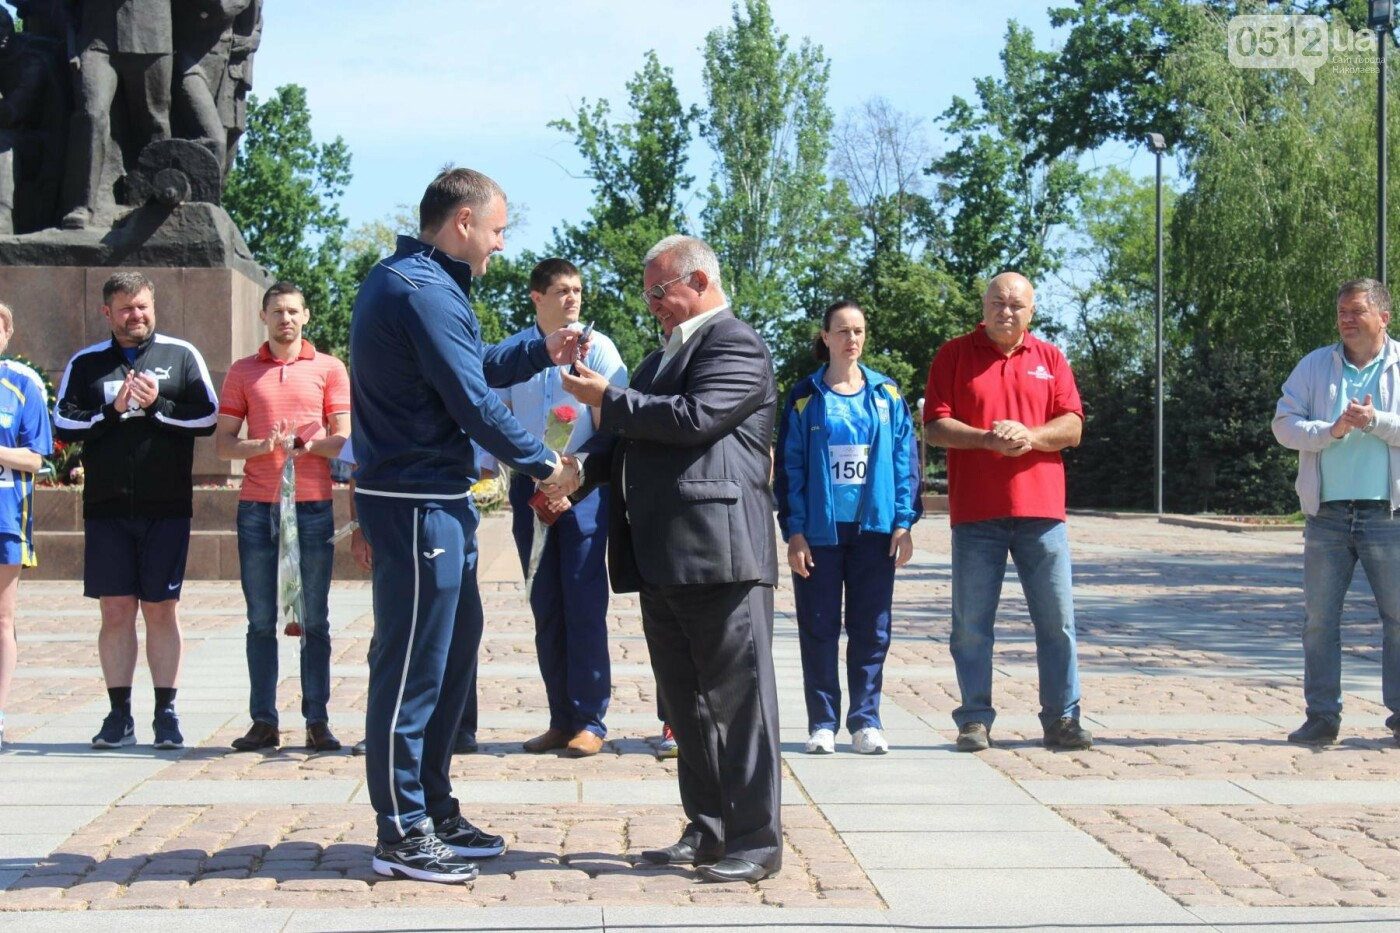 В Николаеве на день олимпийца спортсменам вручили награды и ключи от нового автобуса, - ФОТО , фото-8